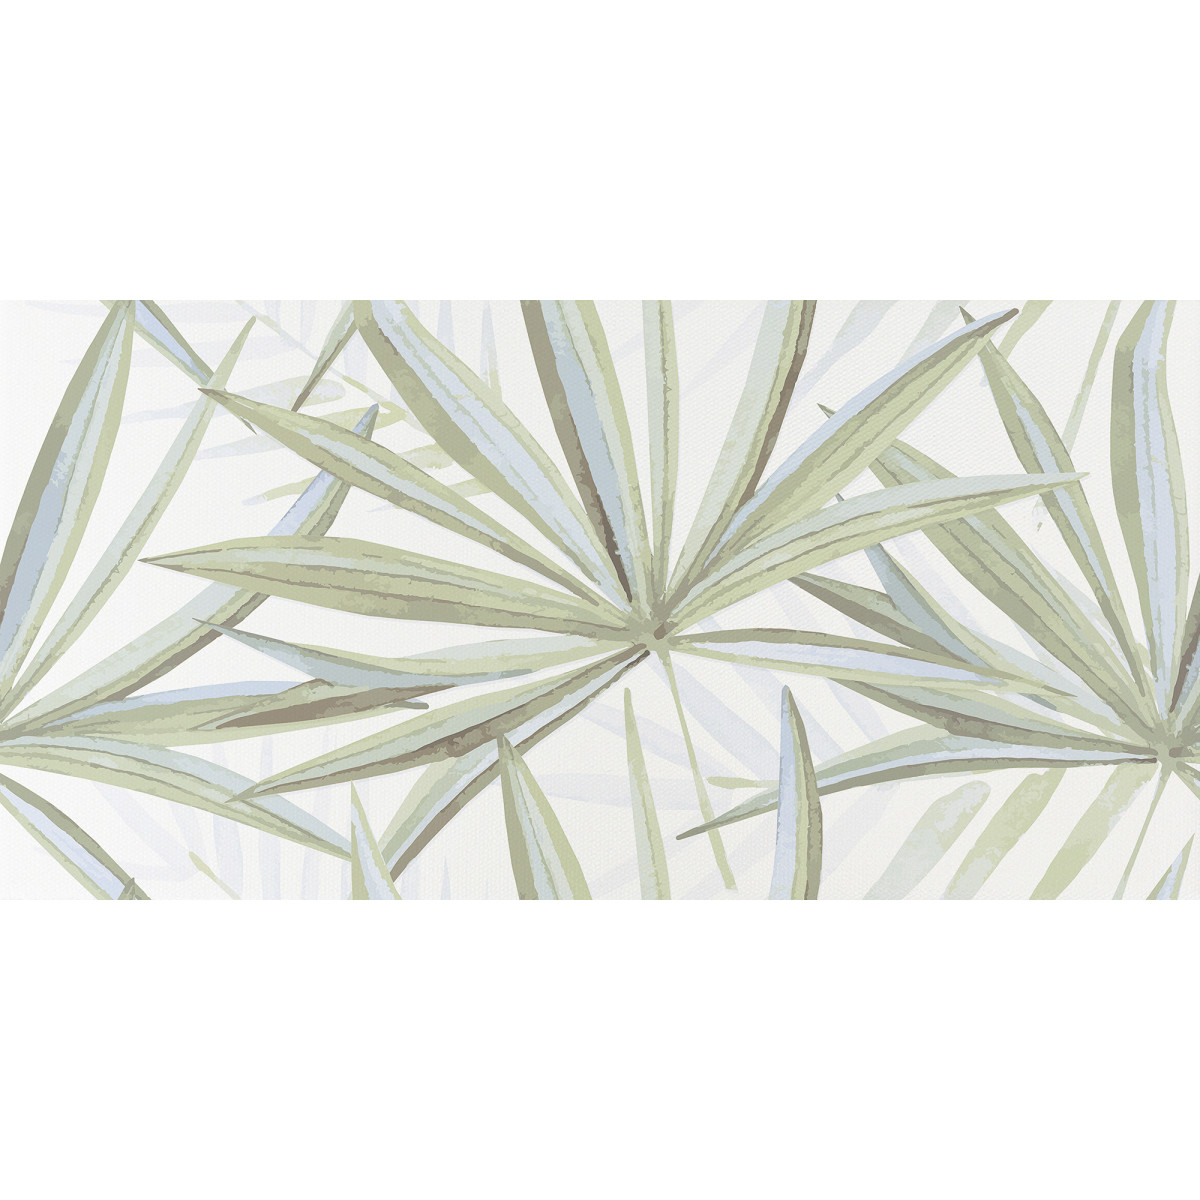 Декор LB Ceramics Моана Бамбук 19.8x39.8 см 1.58 м² цвет белый/зеленый